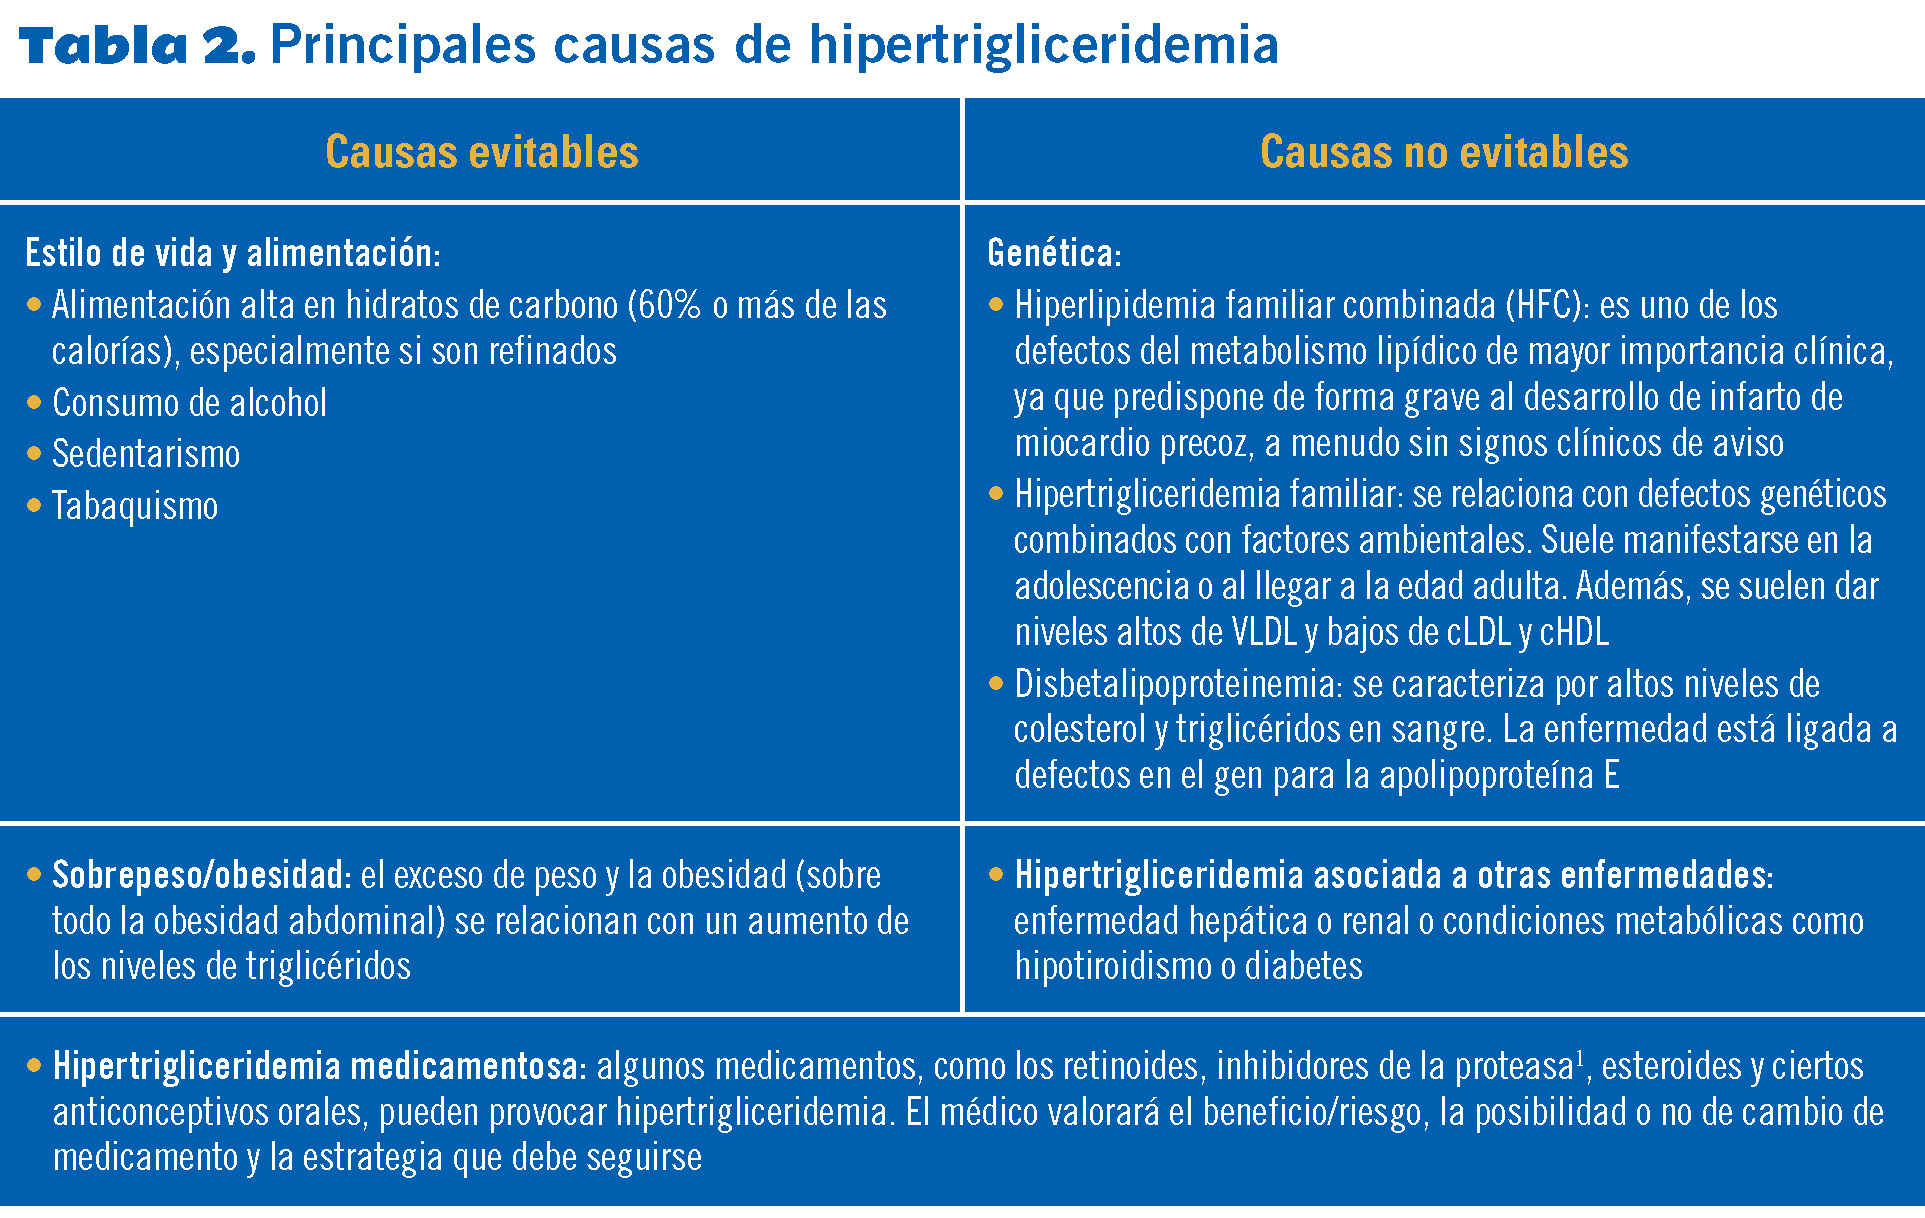 23 EF575 PROTOCOLOS hiperlipidemias tabla 2